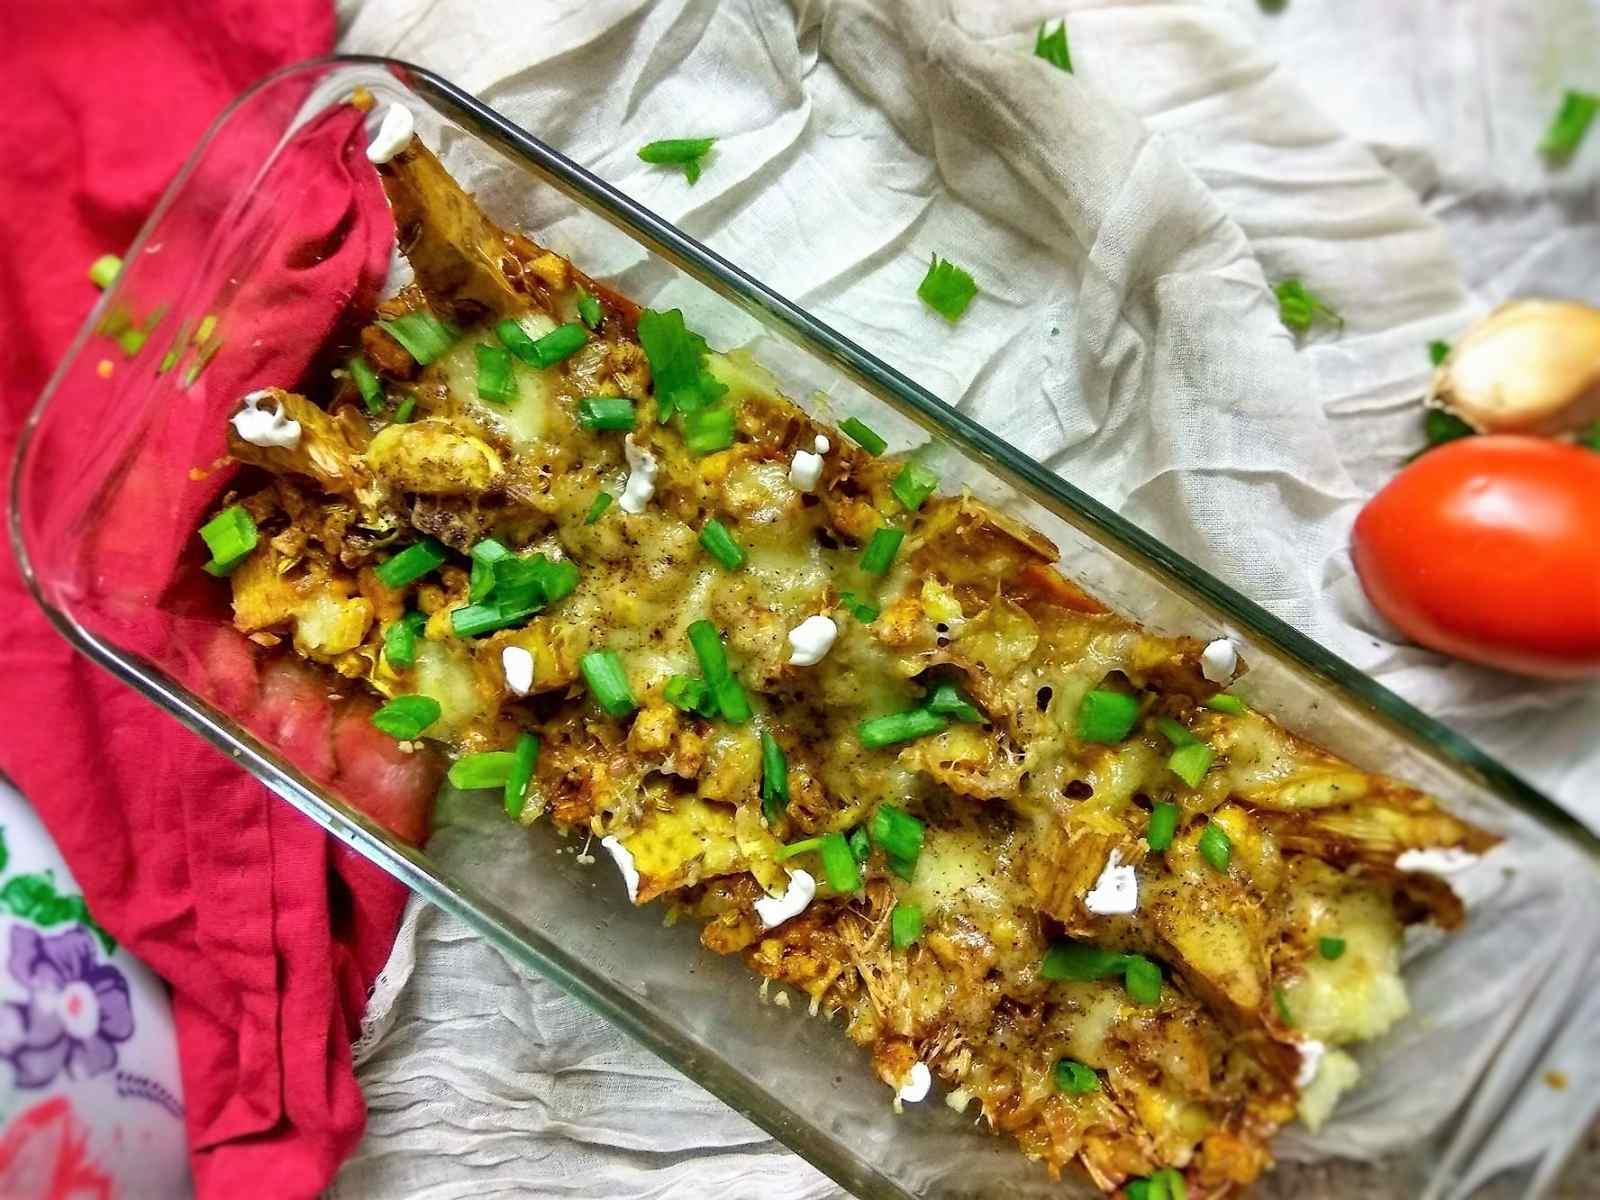 stuffed jackfruit curry stuffed jackfruit curry recipe in hindi forumfinder Images